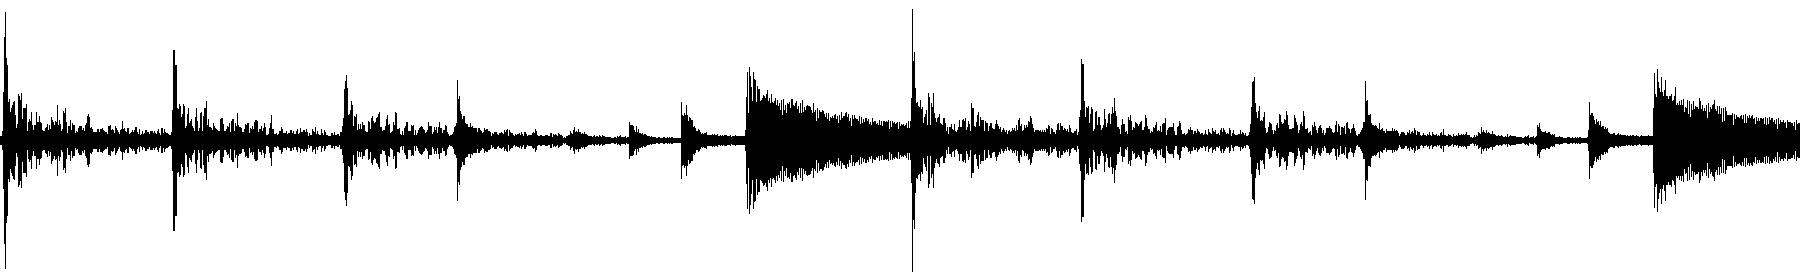 blbc jazzydrums 110 04